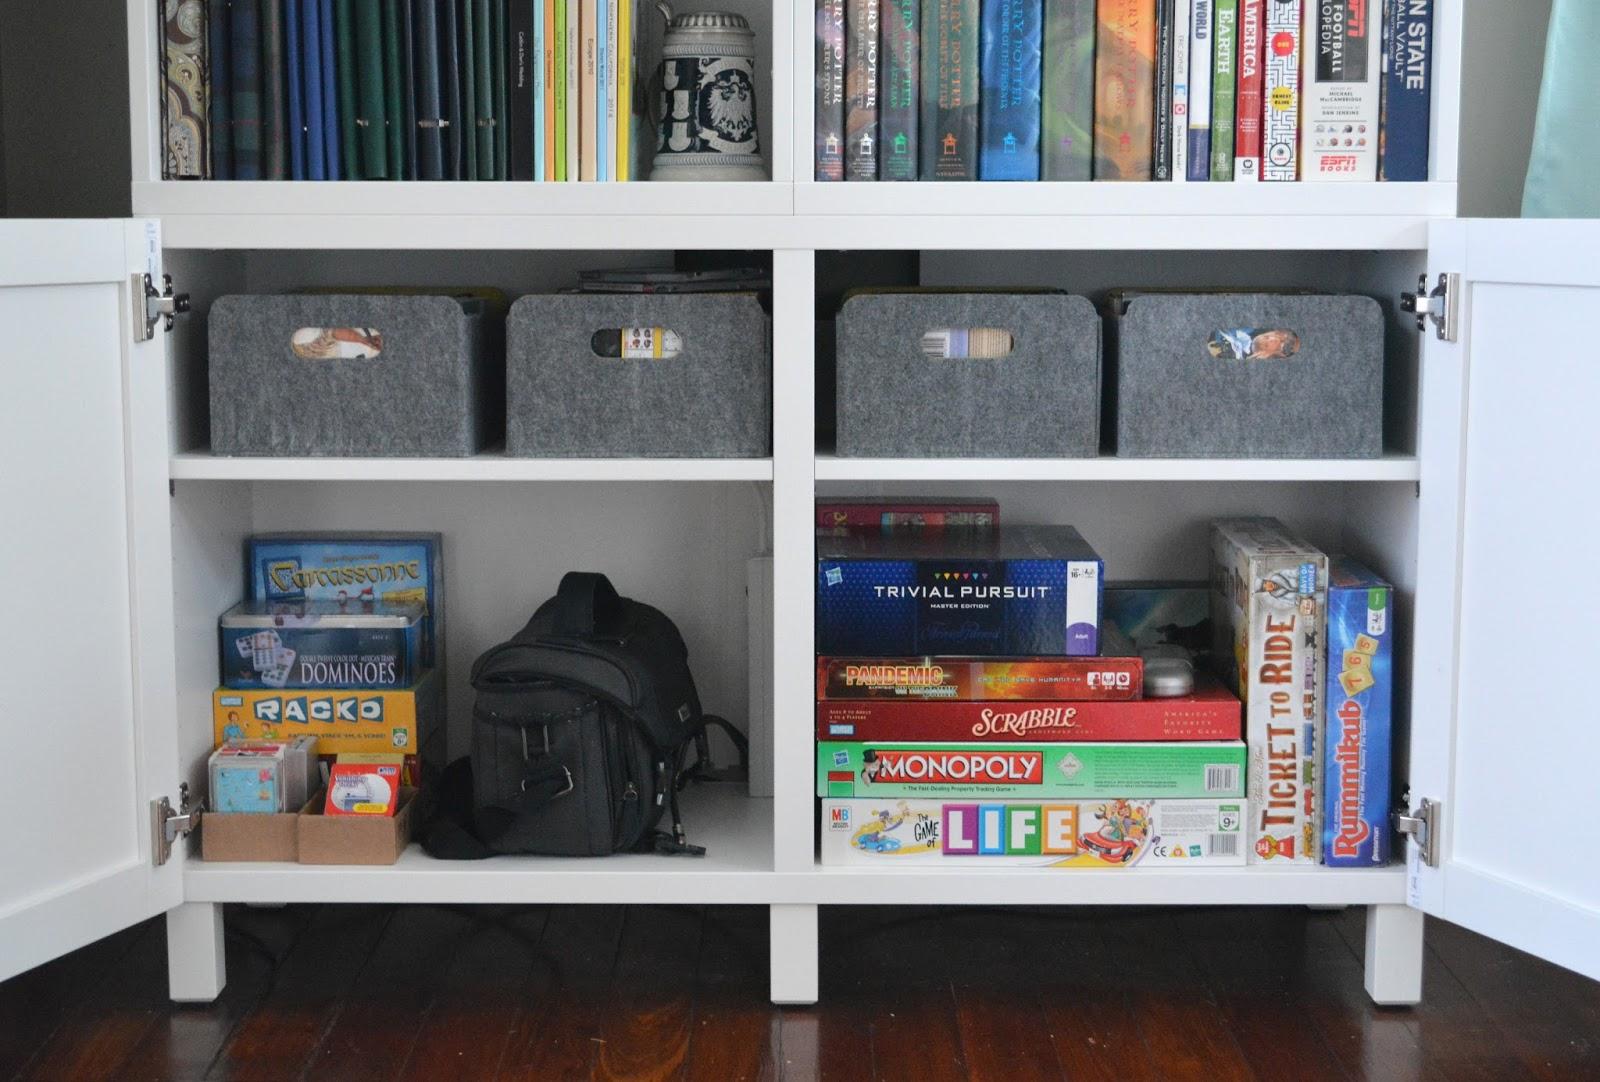 cozy birdhouse | ikea hacking: our customized ikea besta bookshelf